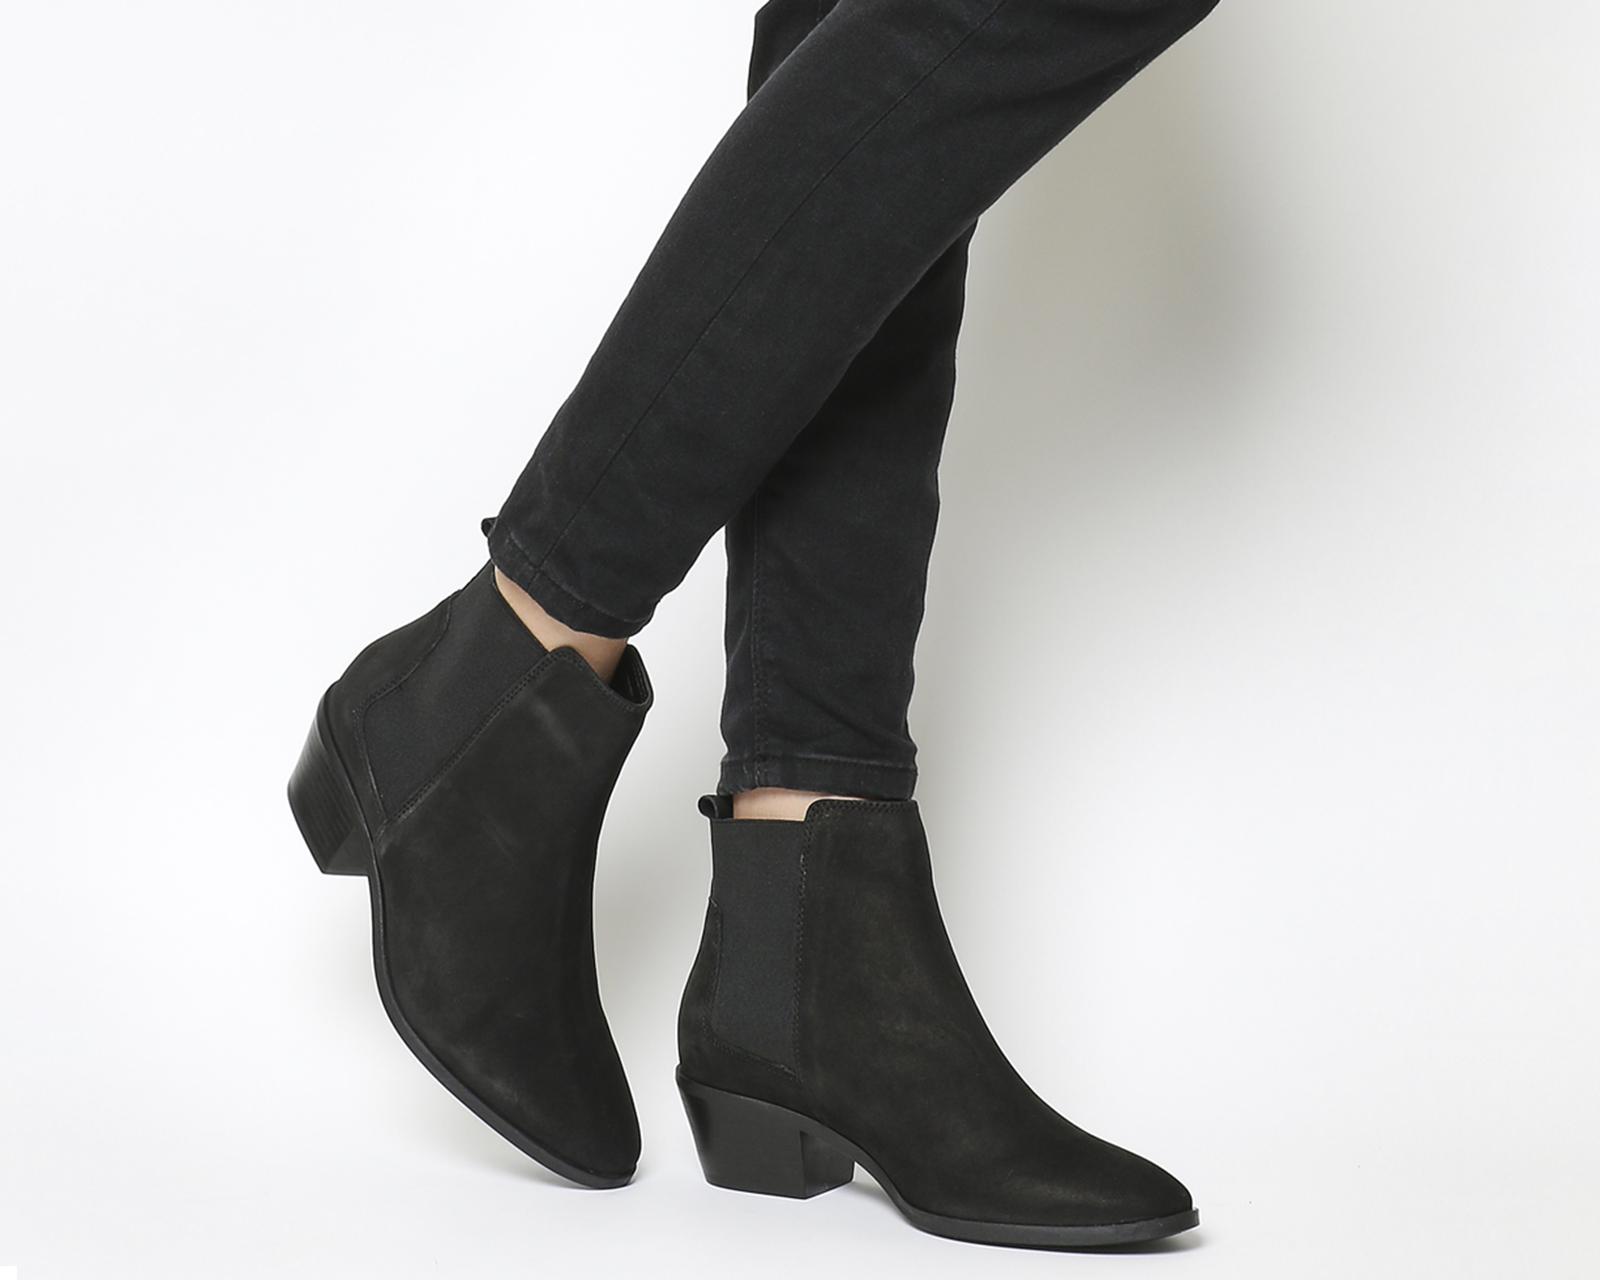 Womens Office Animate Chelsea Boots Black Nubuck